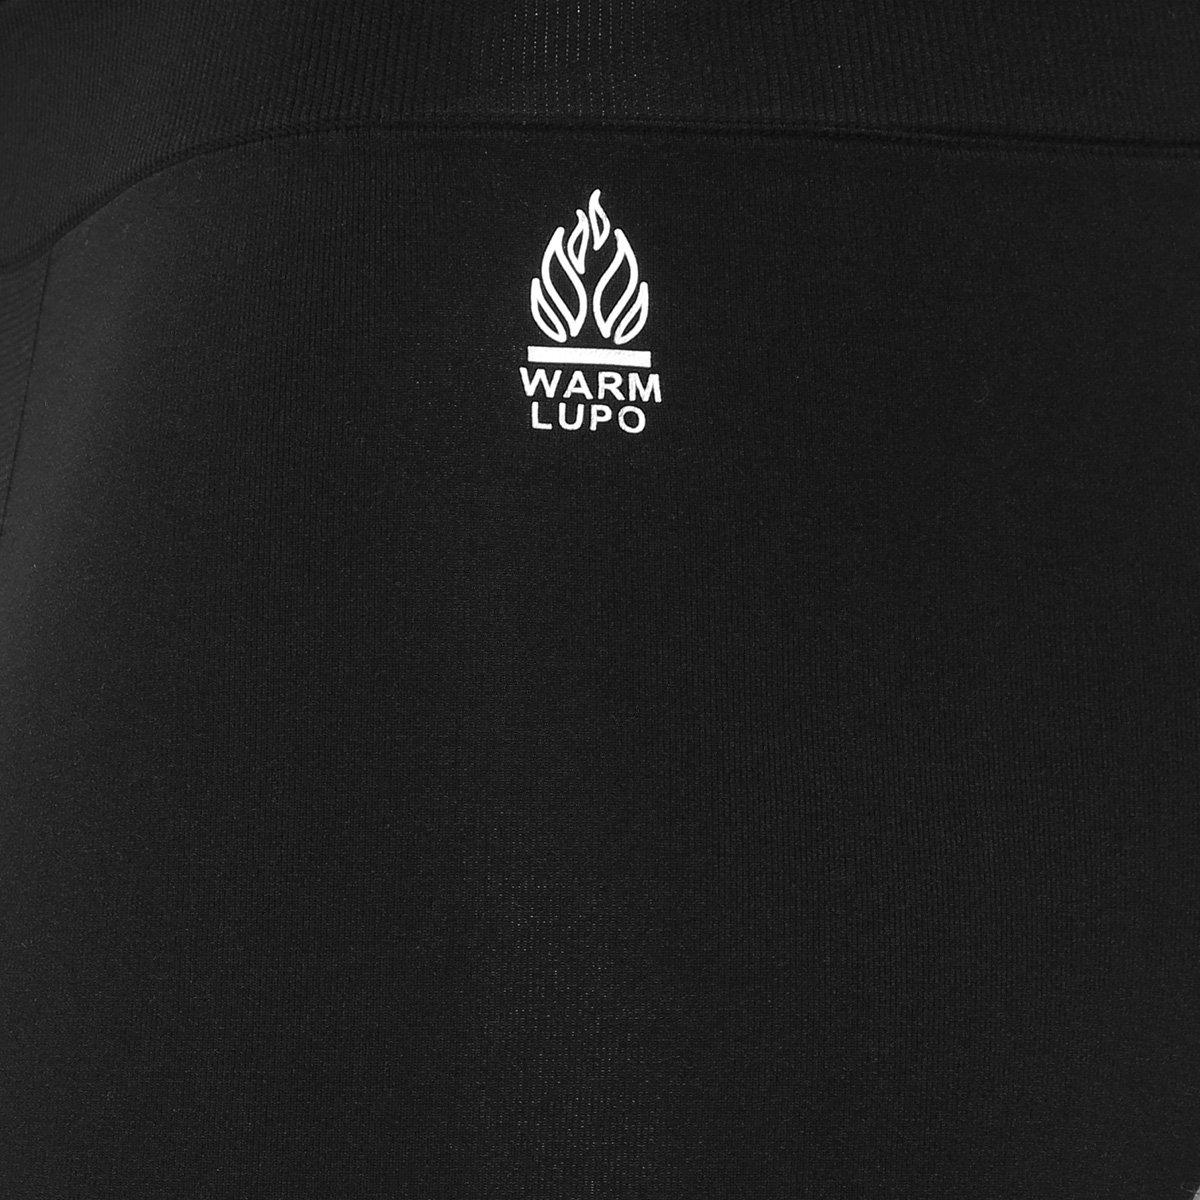 Calça Lupo Underwear Warm Masculina - Preto - Compre Agora  d52f39b658adf